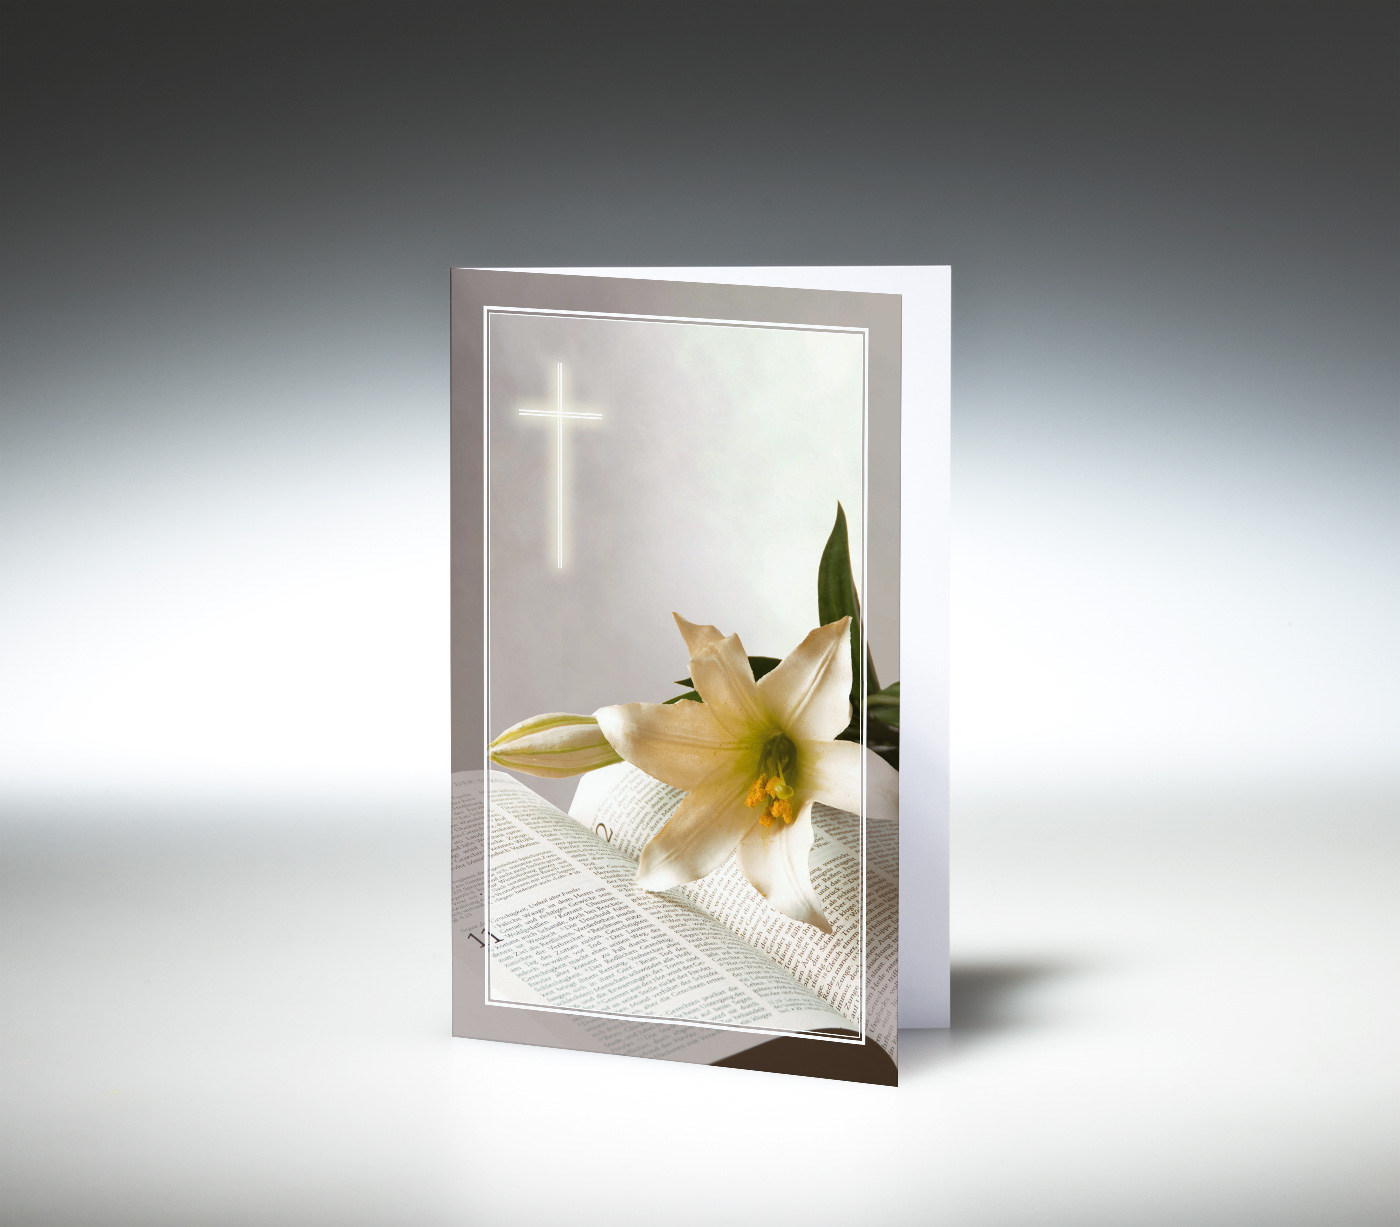 Trauersprüche Bibel Trauersprüche Bibel Bnbnews Co